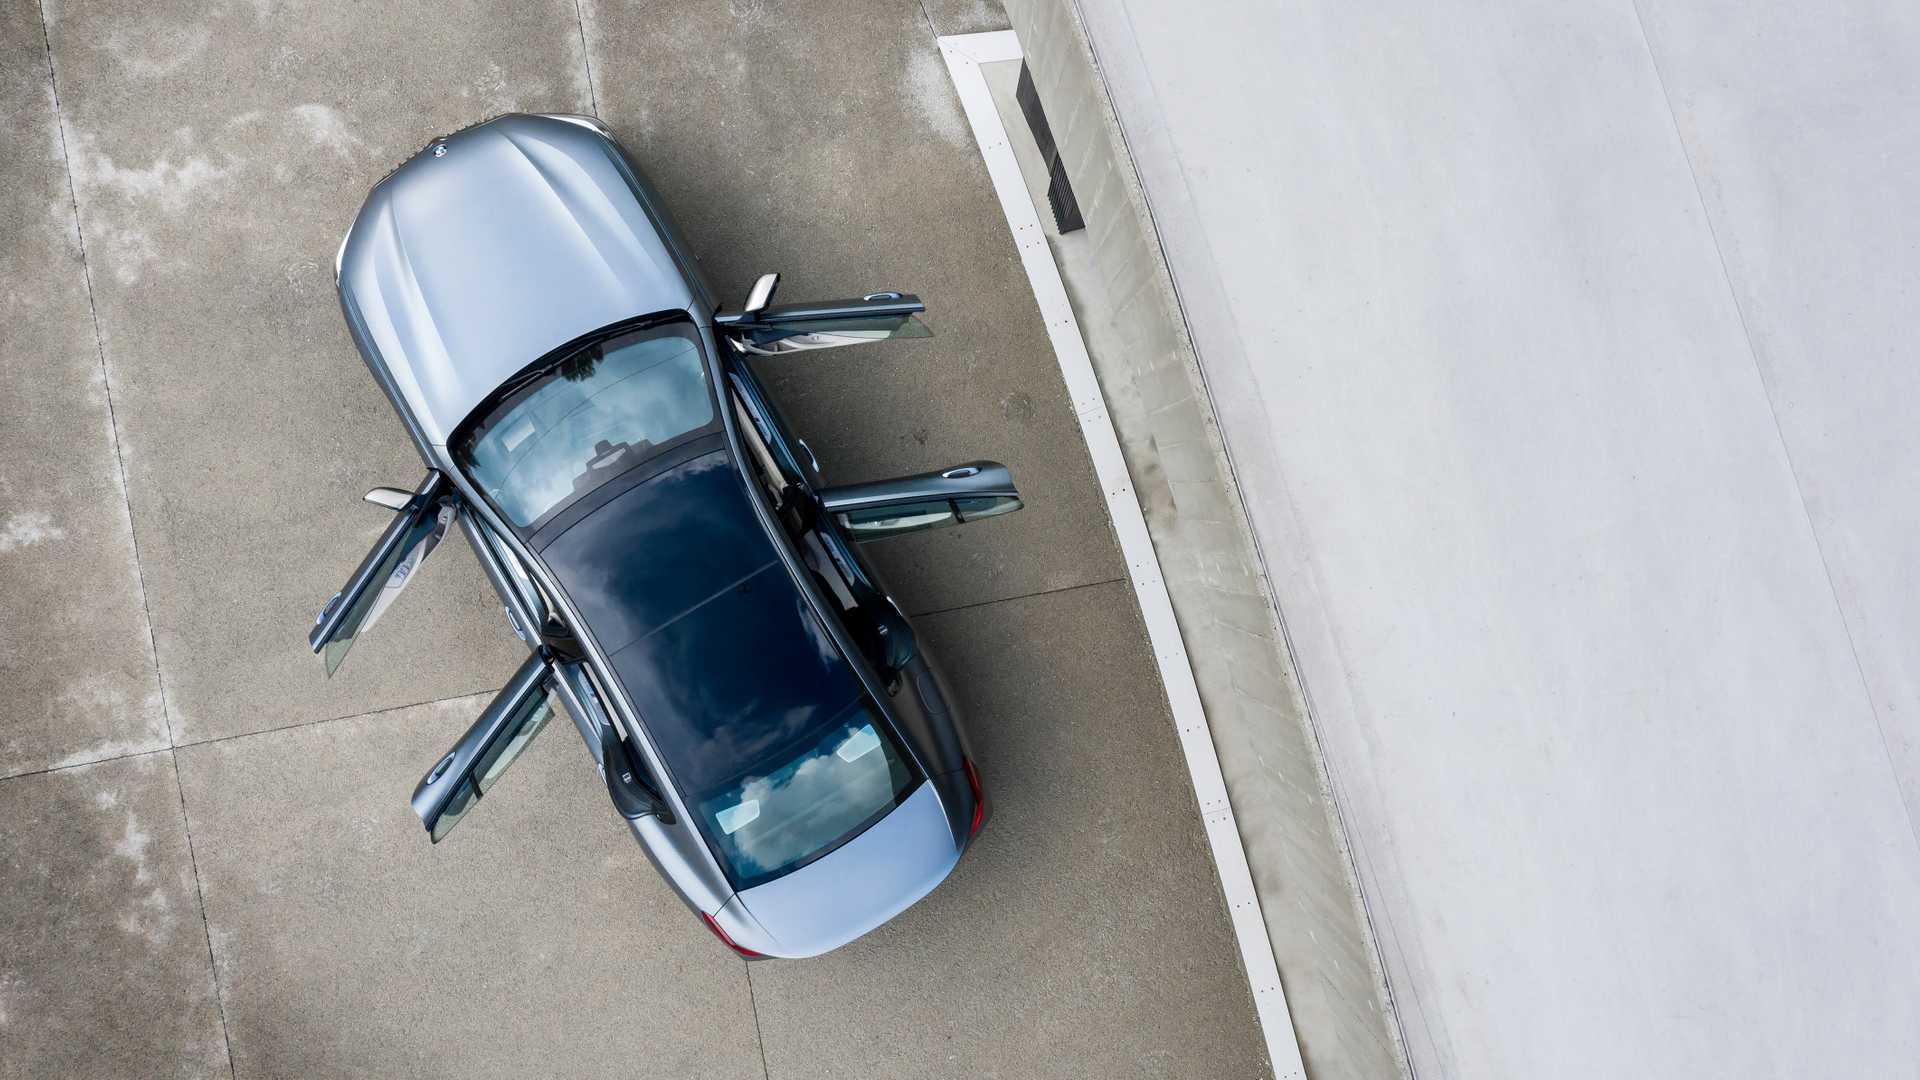 بی ام و سری ۸ گرن کوپه مدل ۲۰۲۰